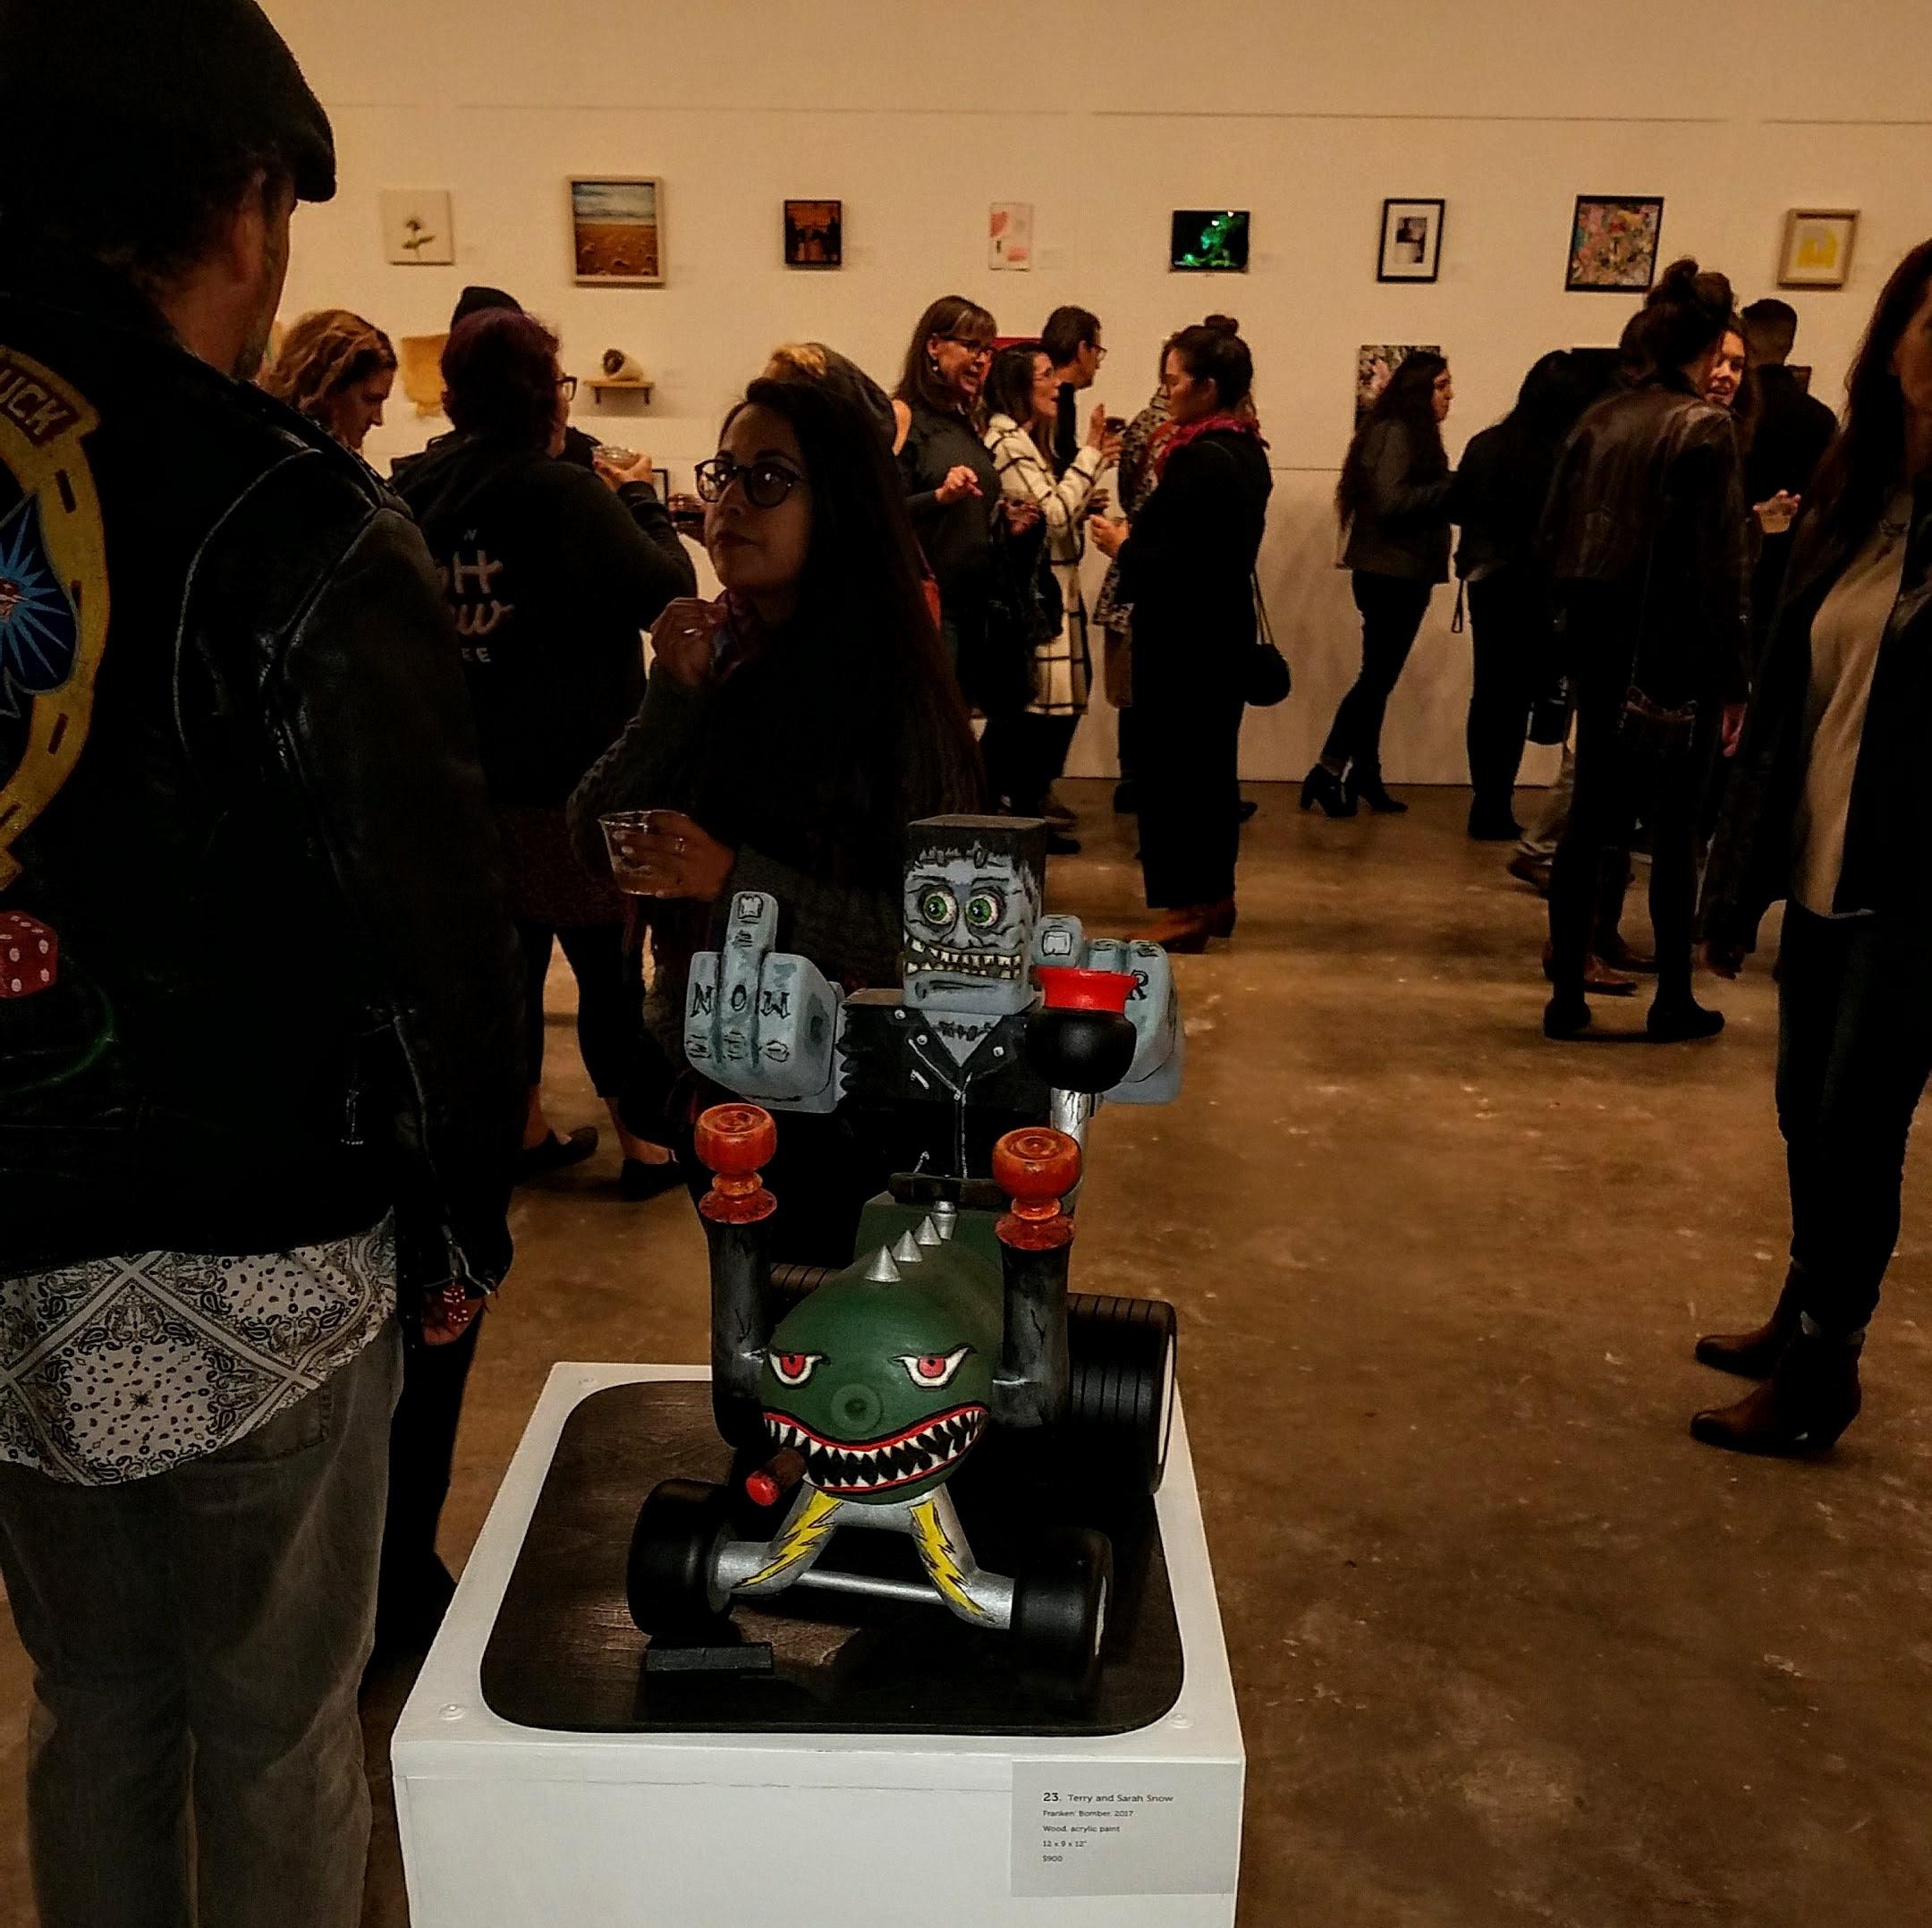 Franken' Bomber on display at the East Austin Studio Tour exhibit in 2017.